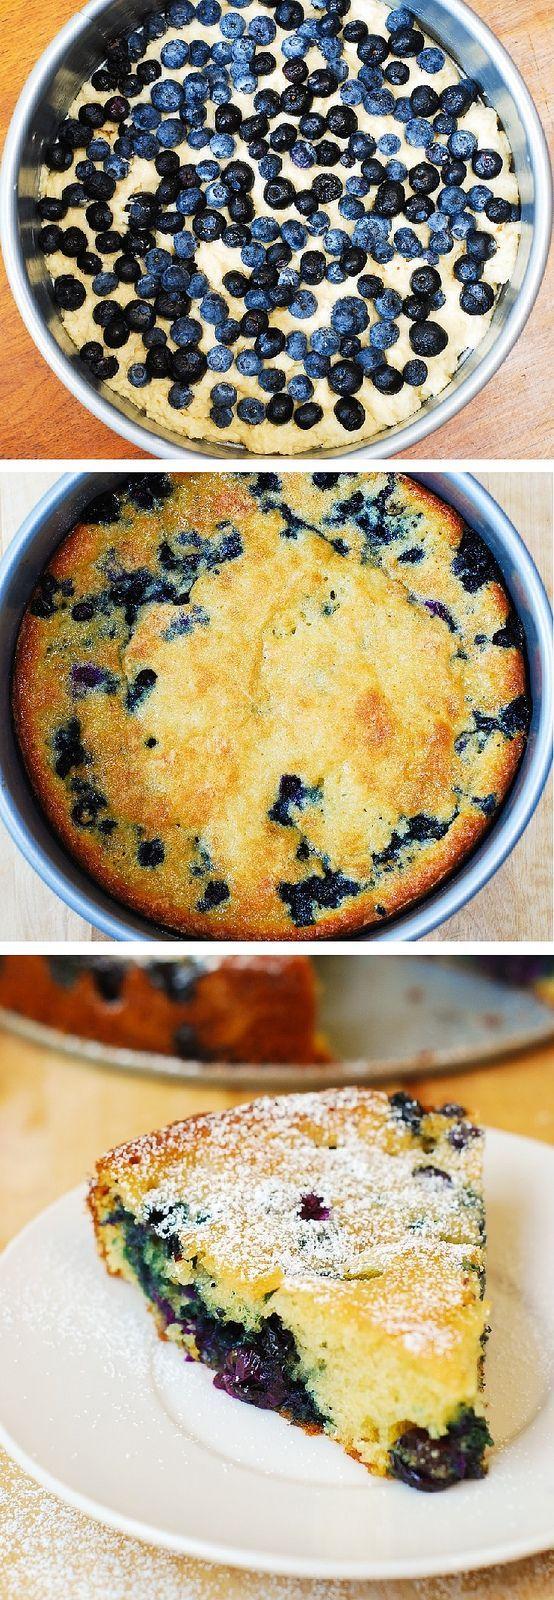 Blueberry Greek yogurt cake - Because I always have berries and Greek yogurt to use up.